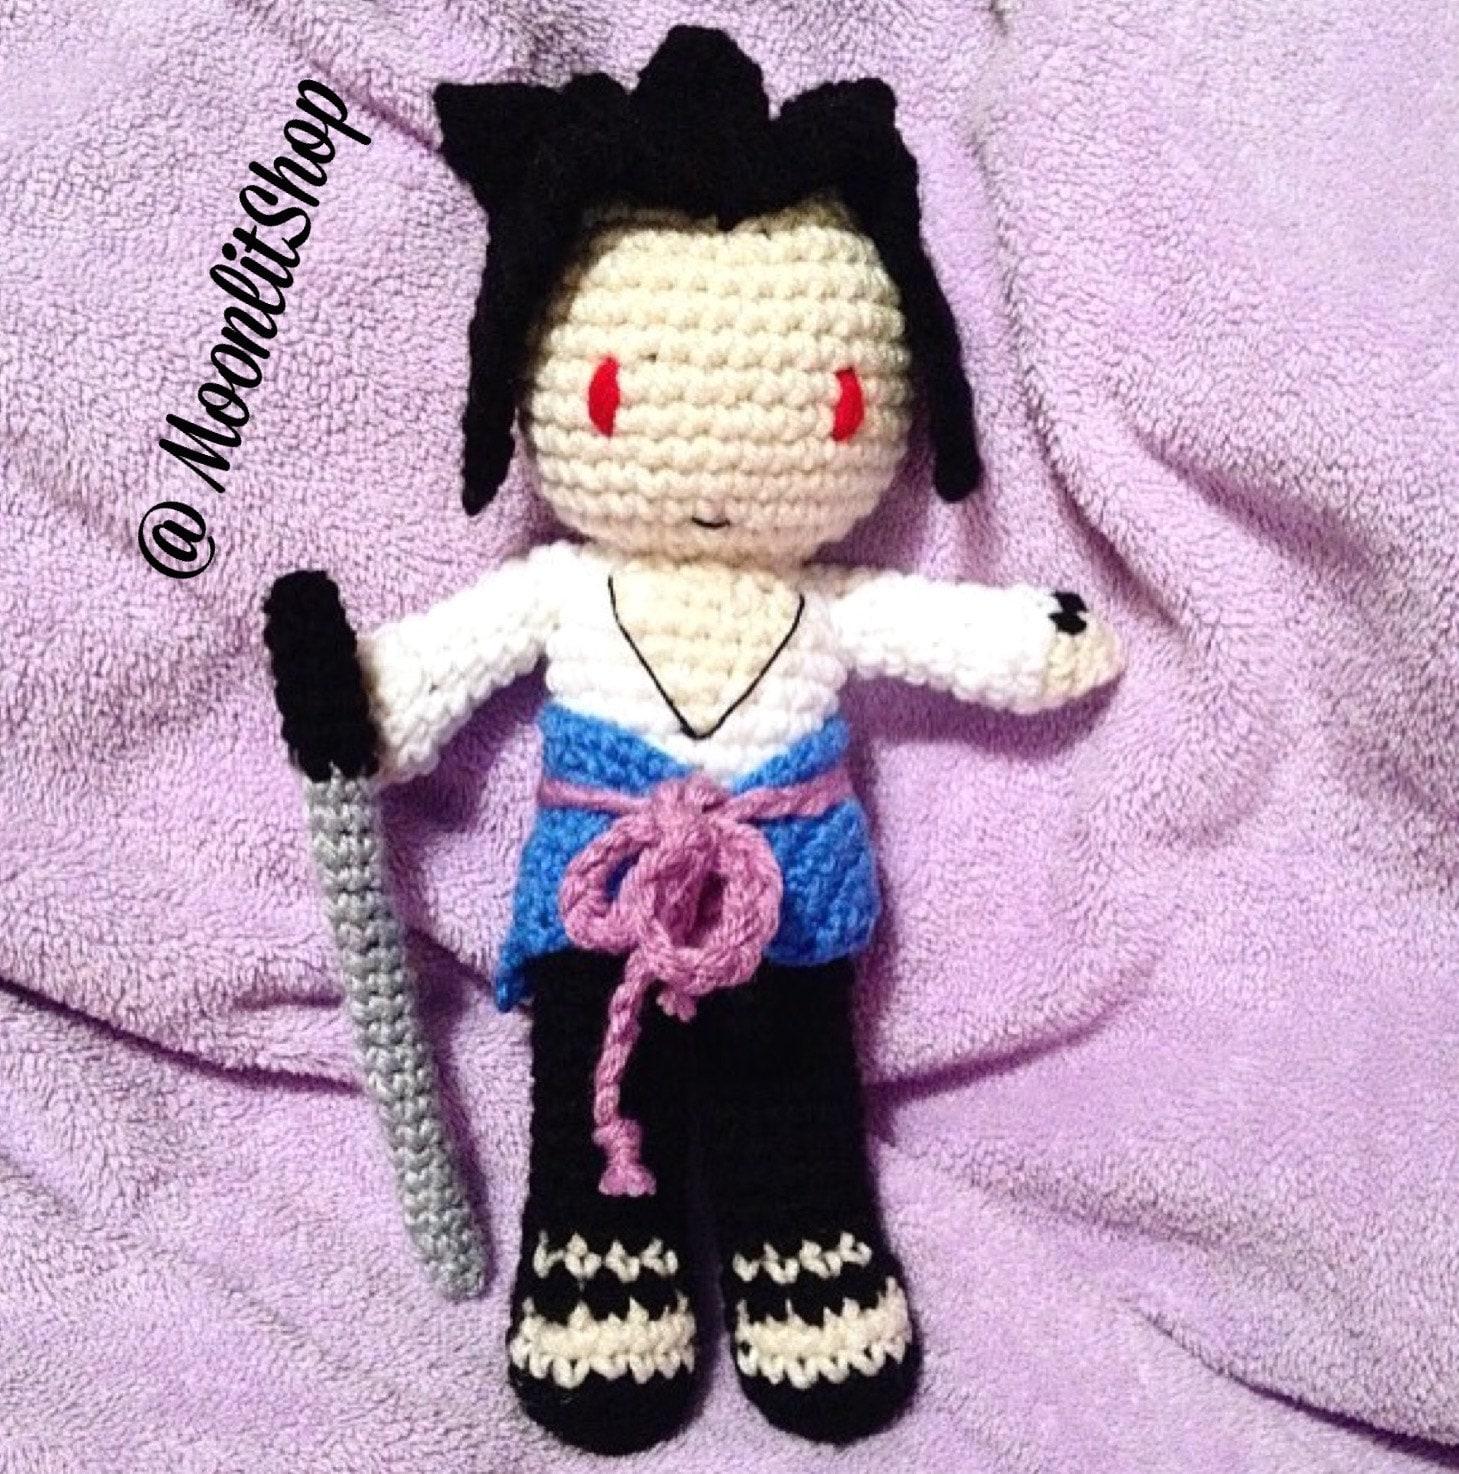 Amigurumi Naruto Pattern : Naruto Shippuden Inspired Crochet Sasuke Uchiha Amigurumi Doll